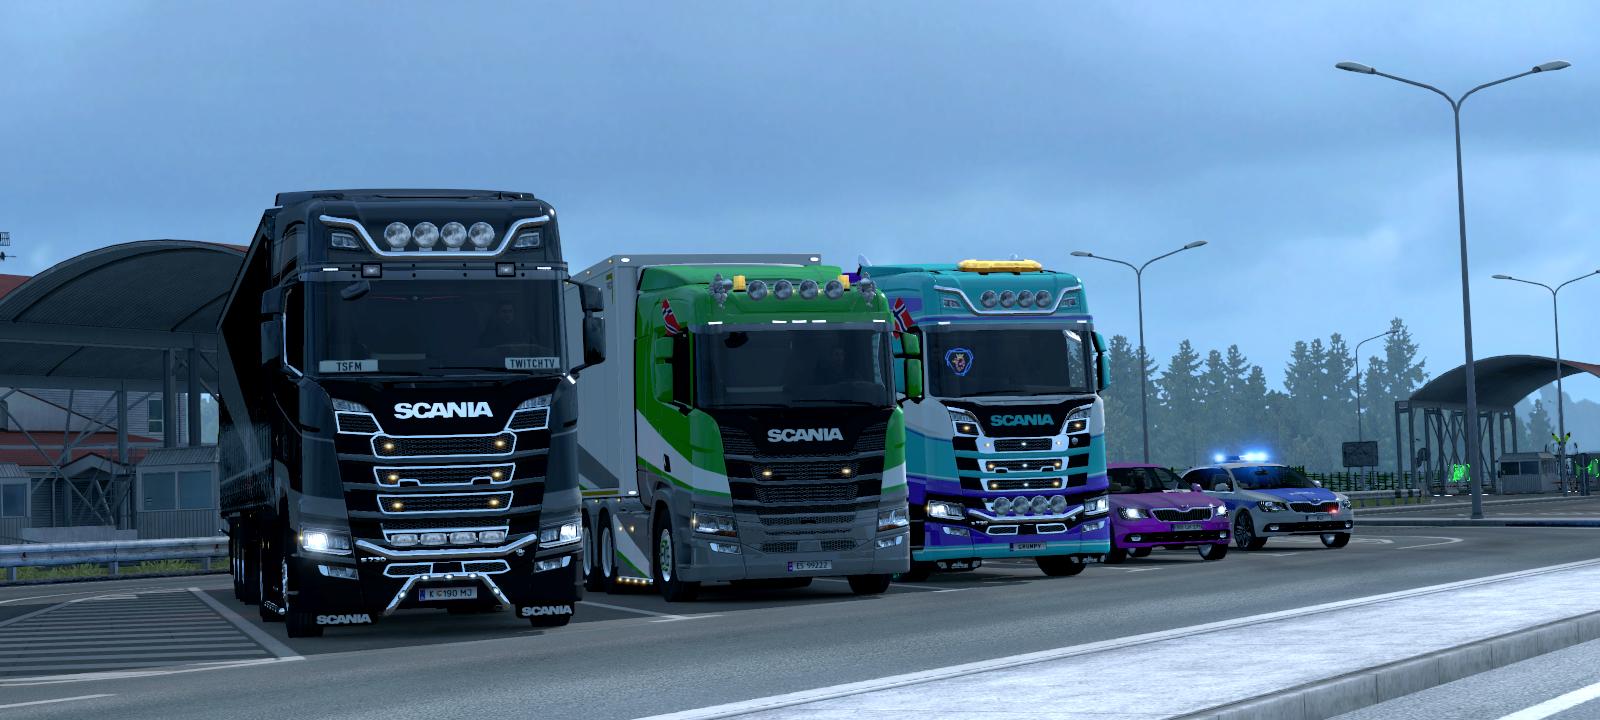 eurotrucks2-2019-03-10-10-54-29.png